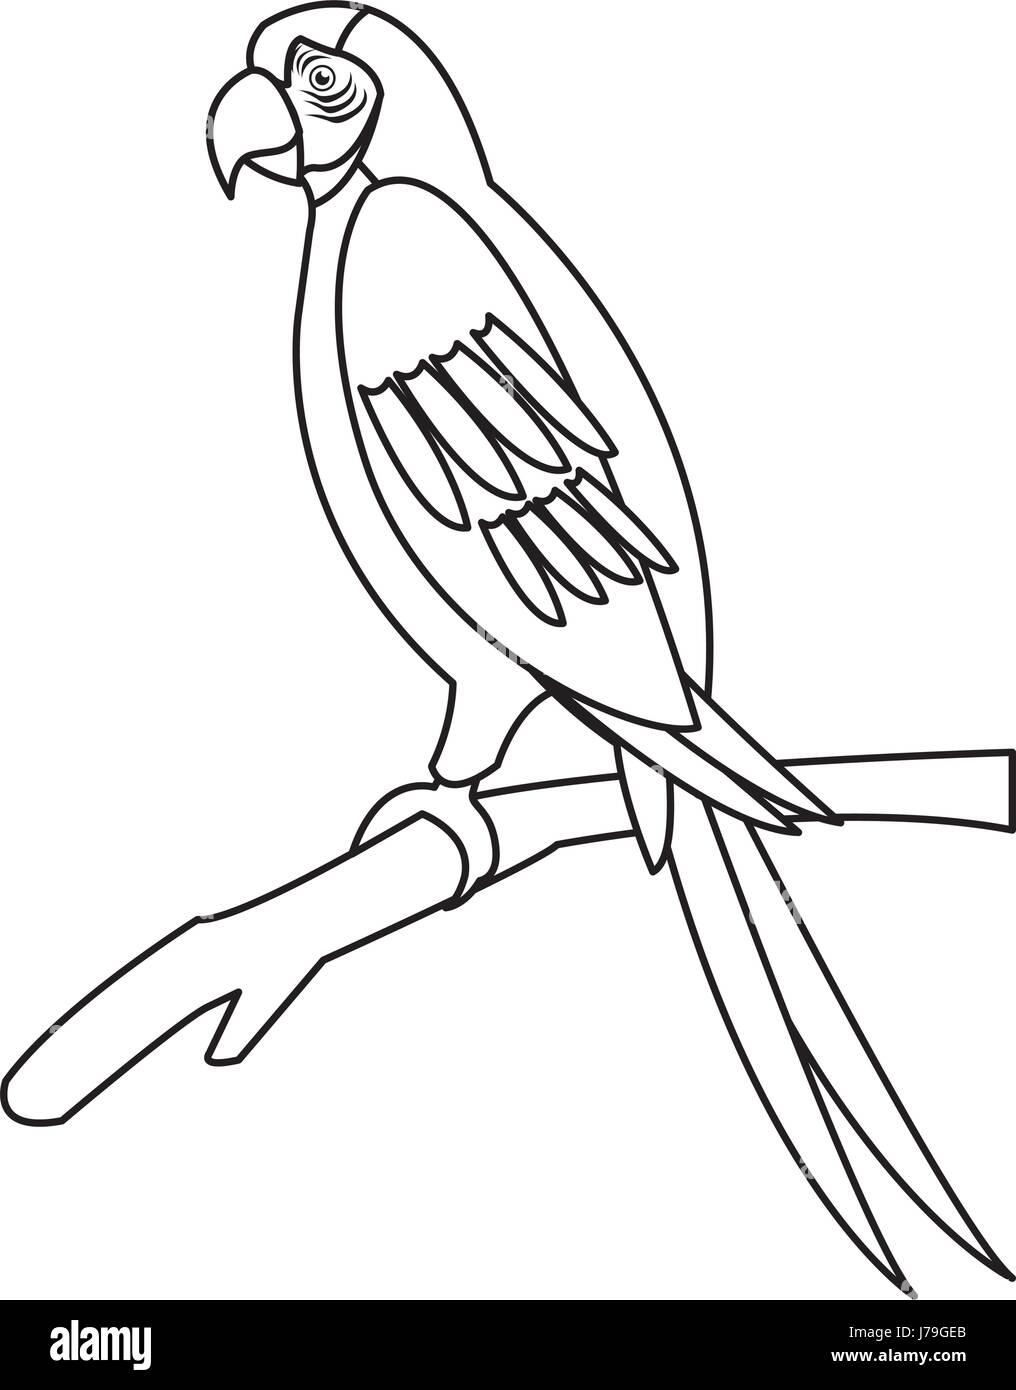 macaw parrot branch brazil bird wildlife outline